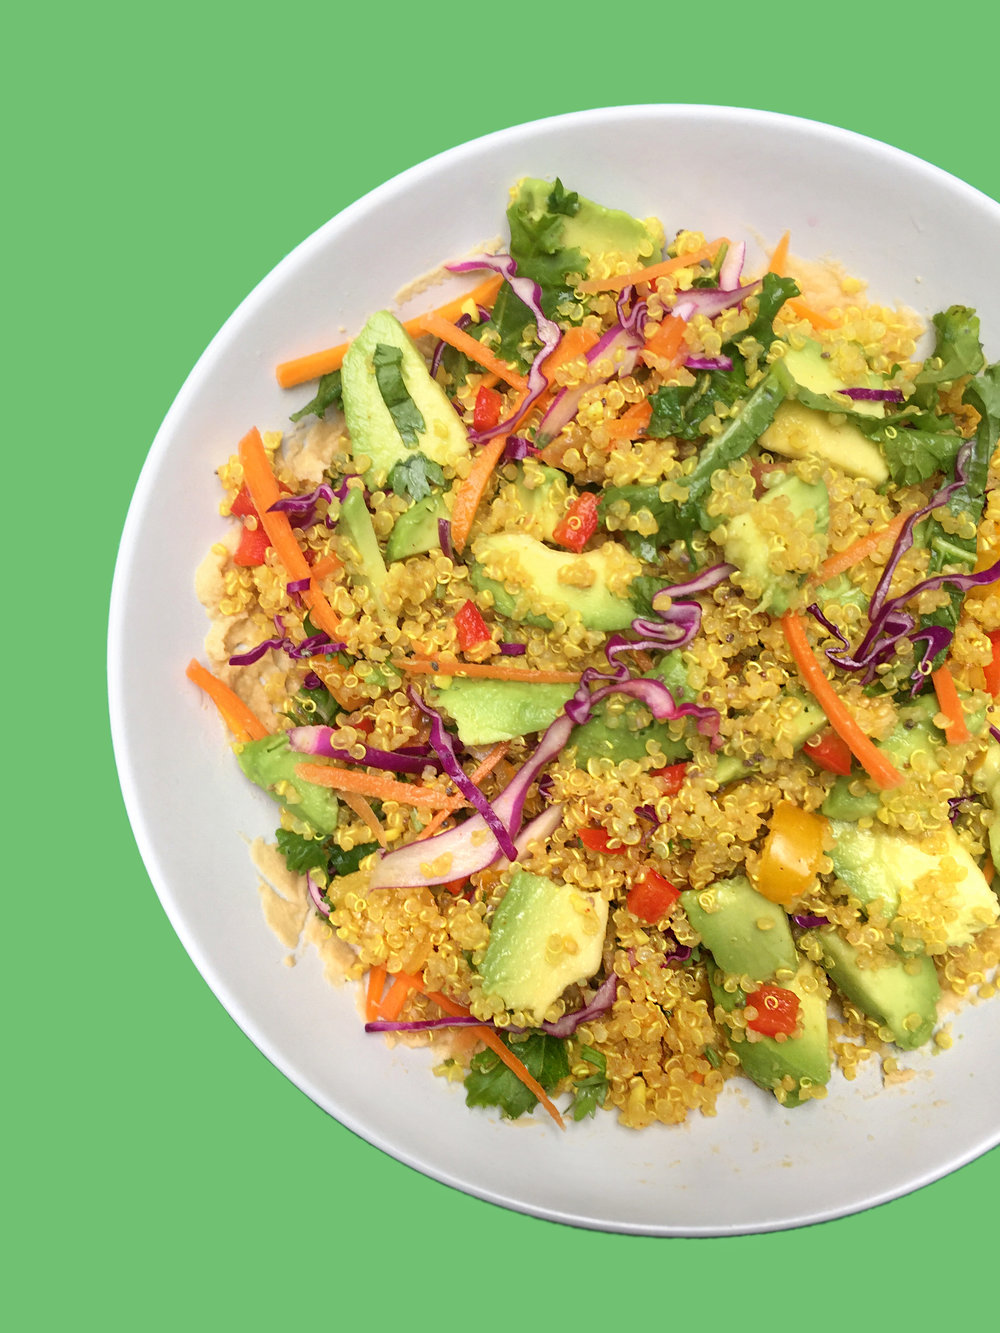 amy_chen_design_quinoa_bowl_recipe_ingredients_3.jpg